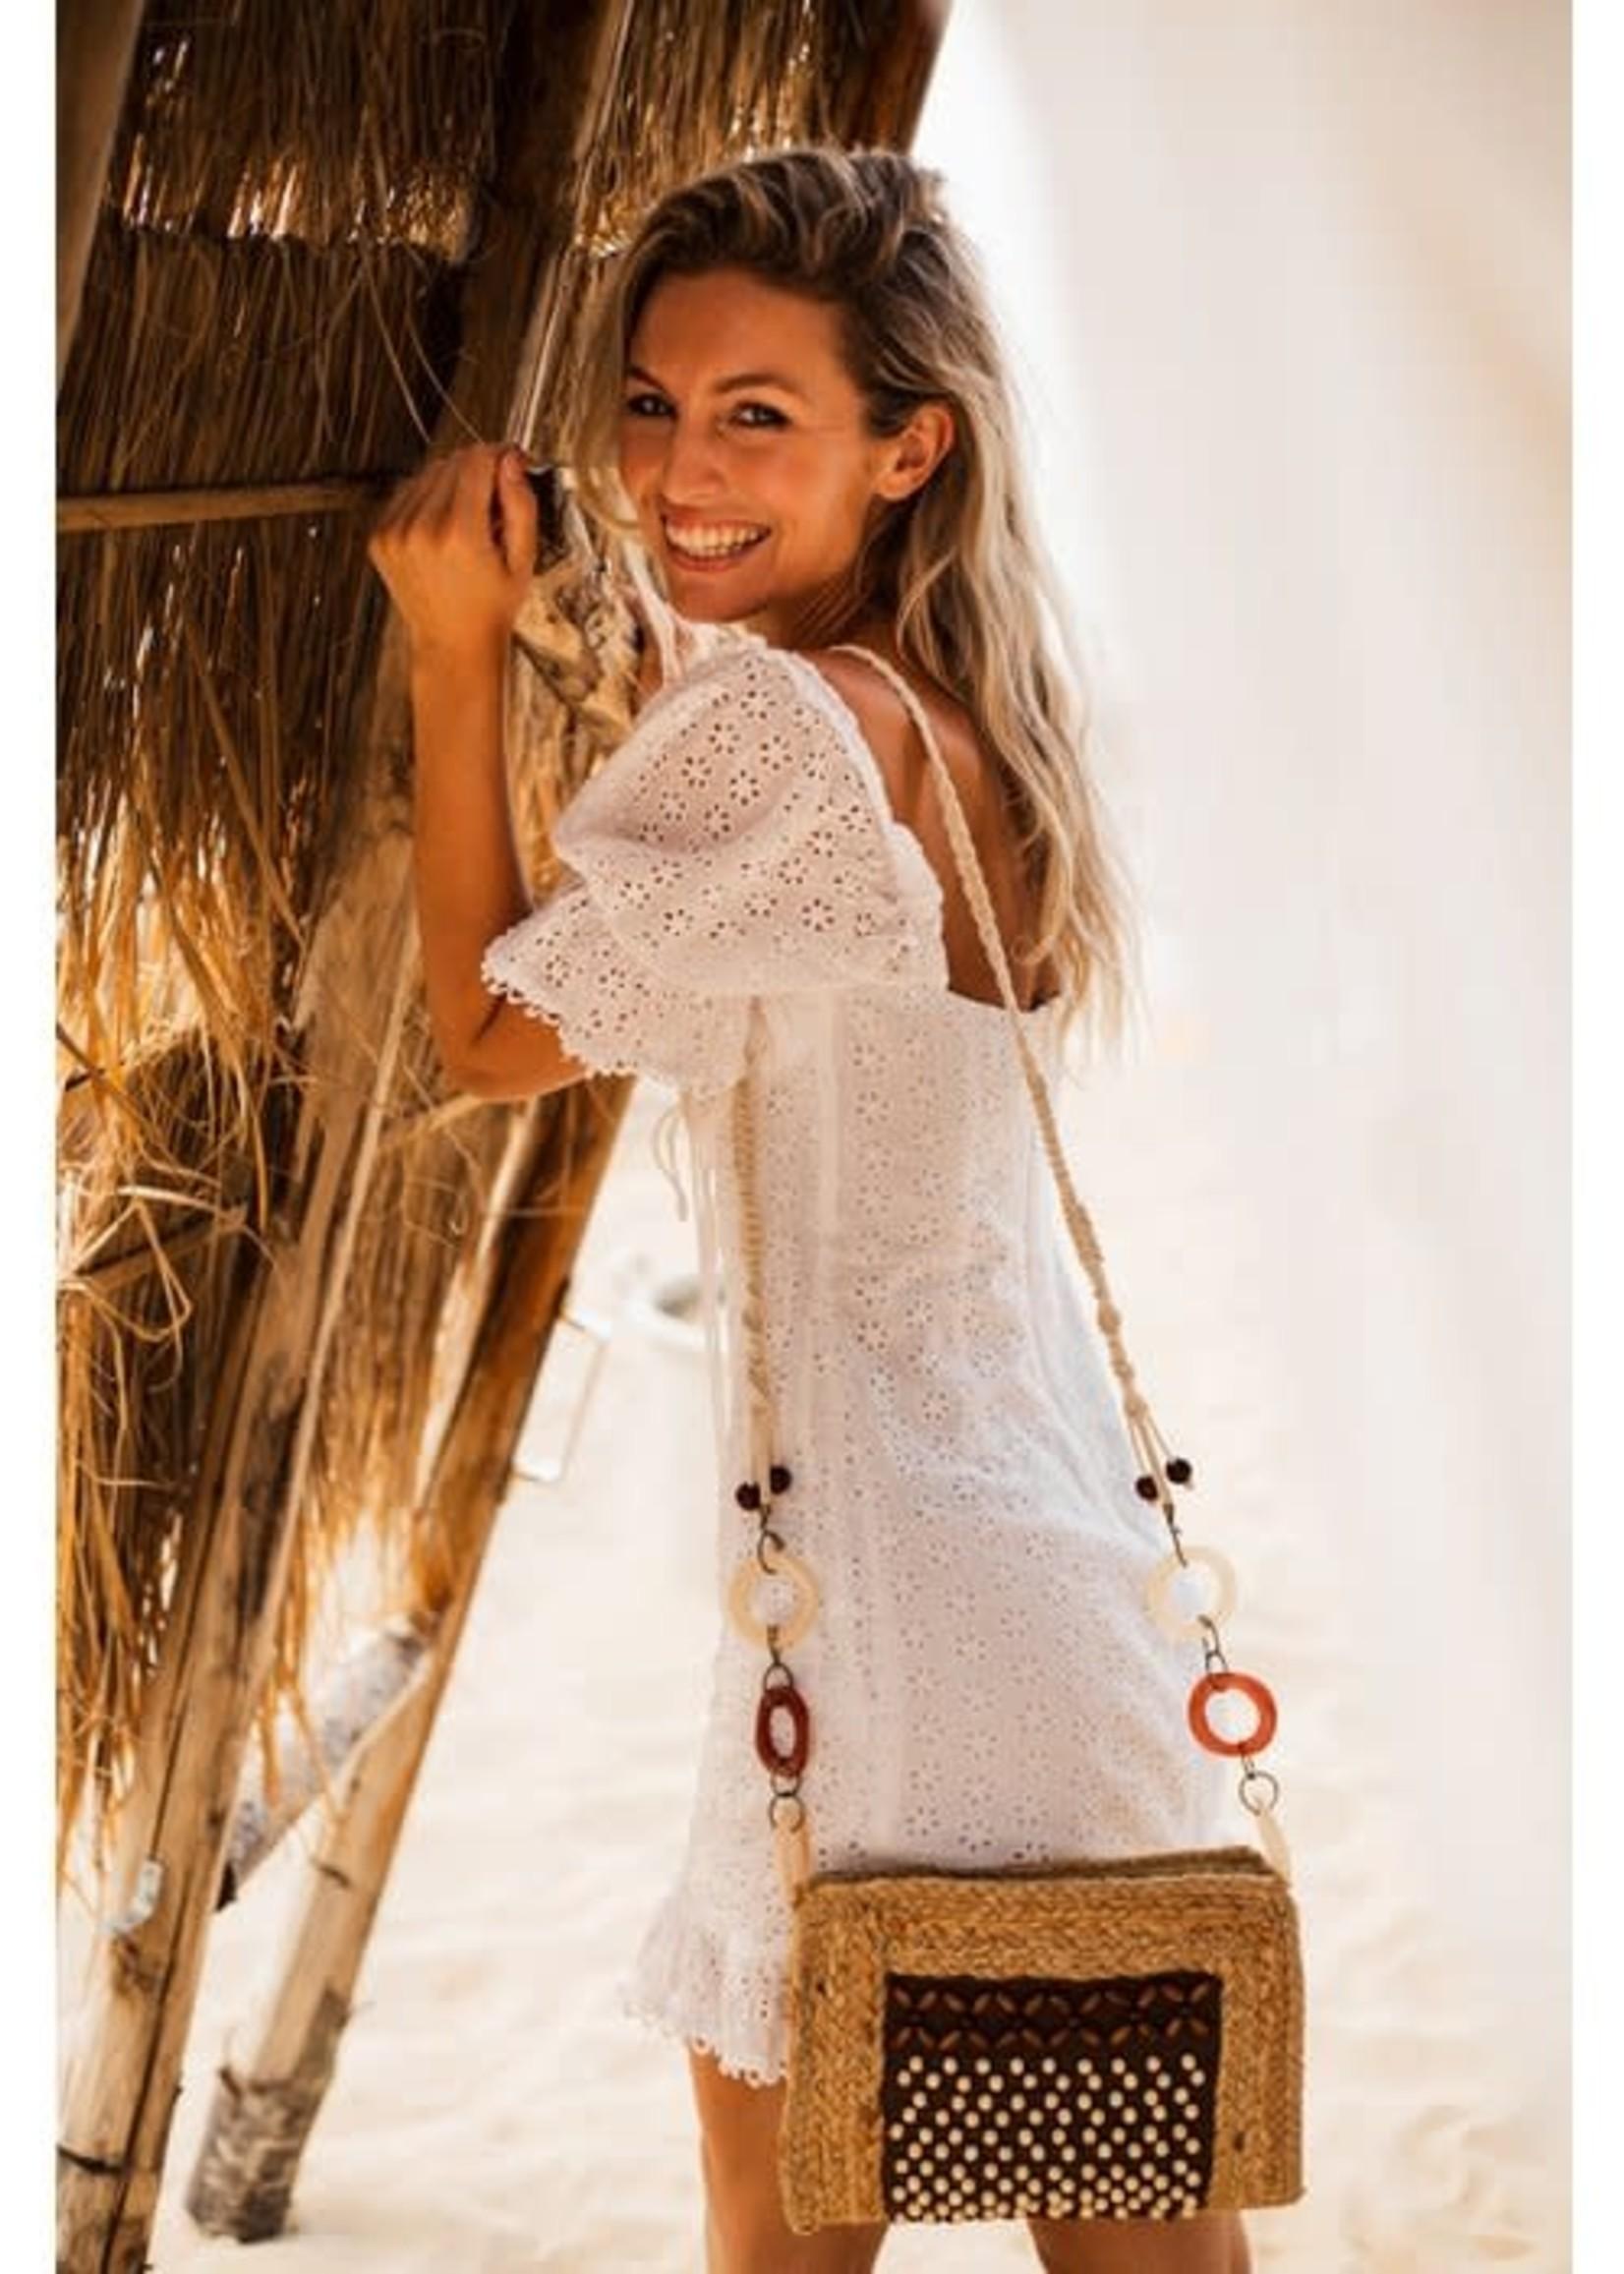 Mycha Ibiza Mycha Ibiza - Jute Tas - rechthoekig  Cala Jondal